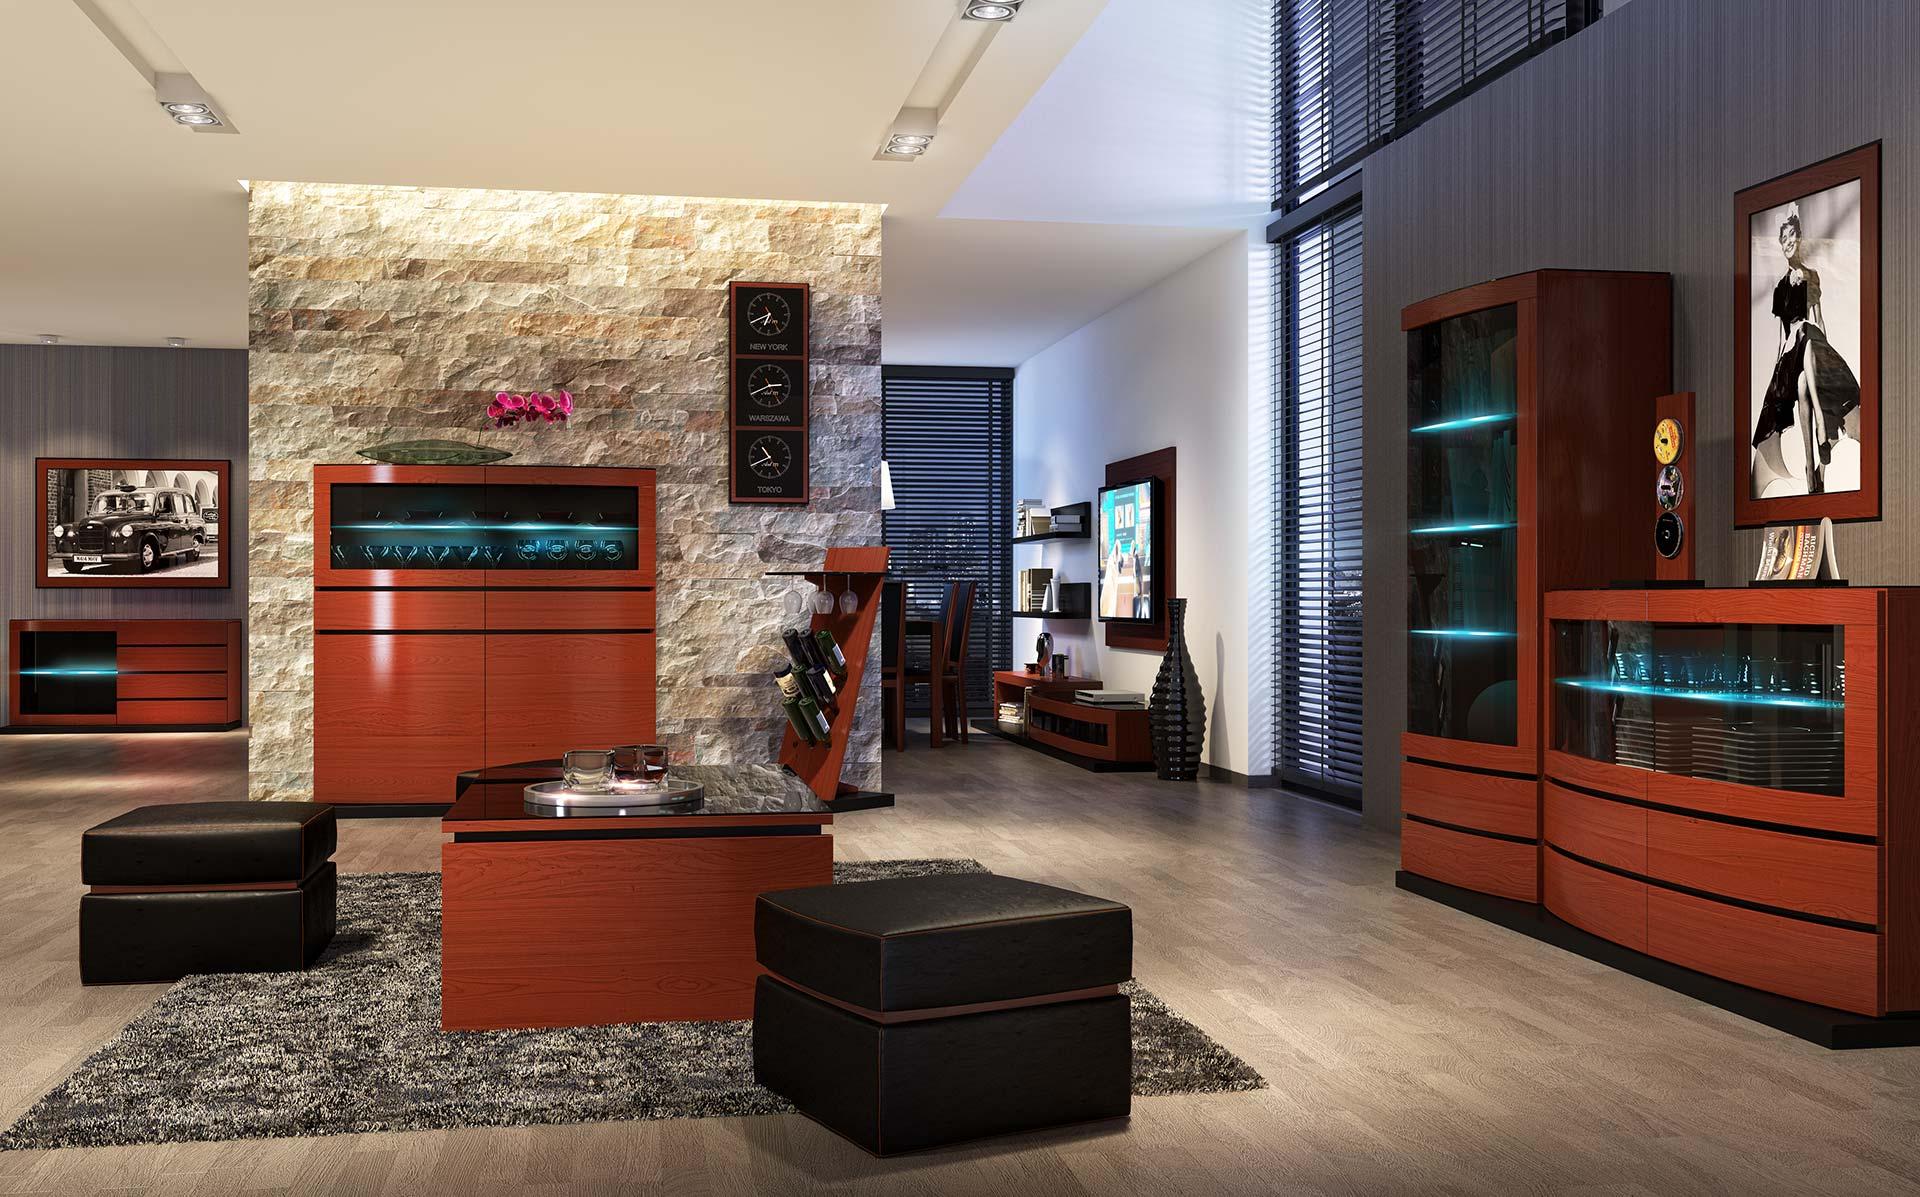 mebin offers solid wood furniture bedroom furniture living room